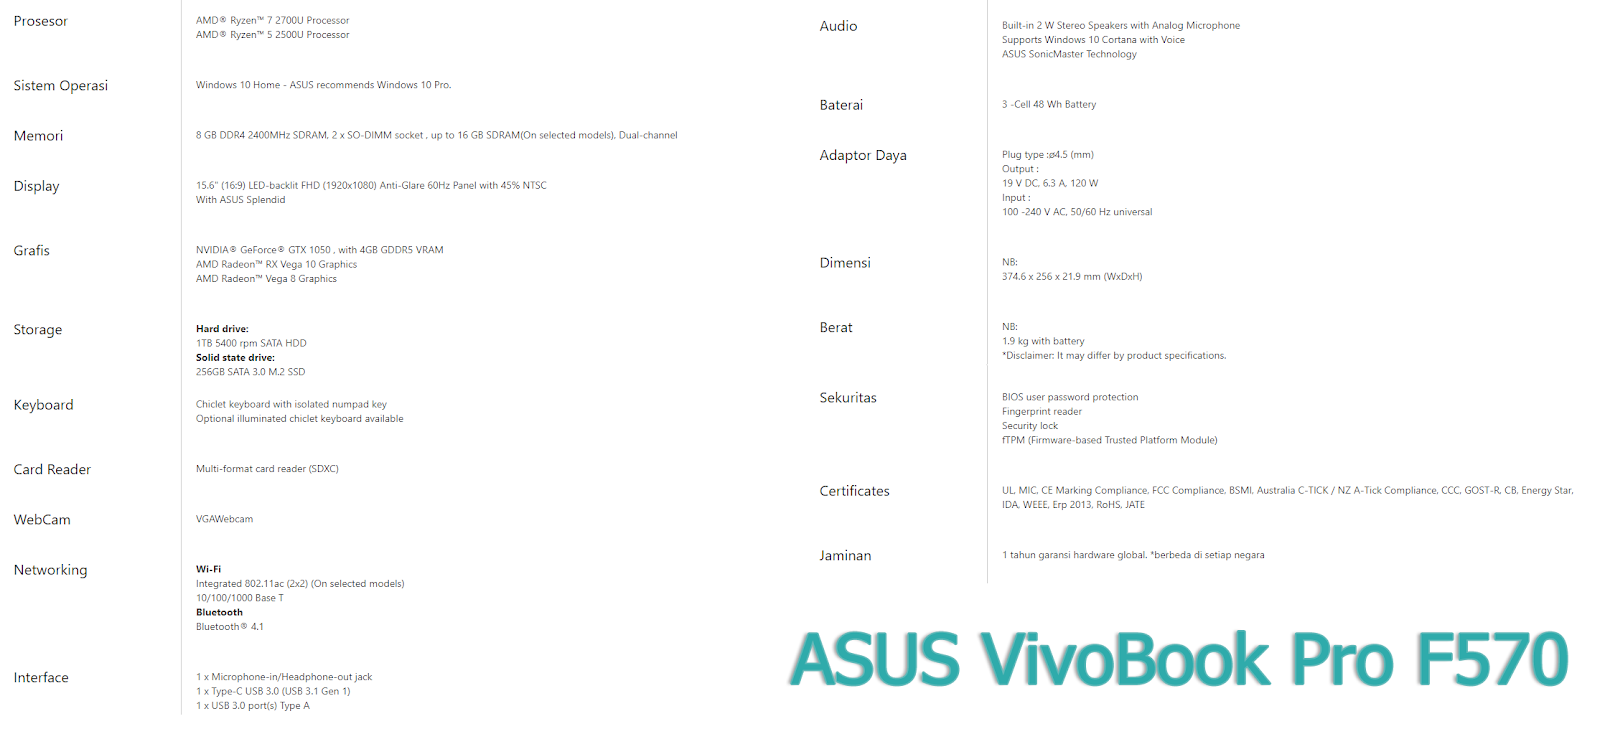 Spesifikasi Laptop ASUS VivoBook Pro F570